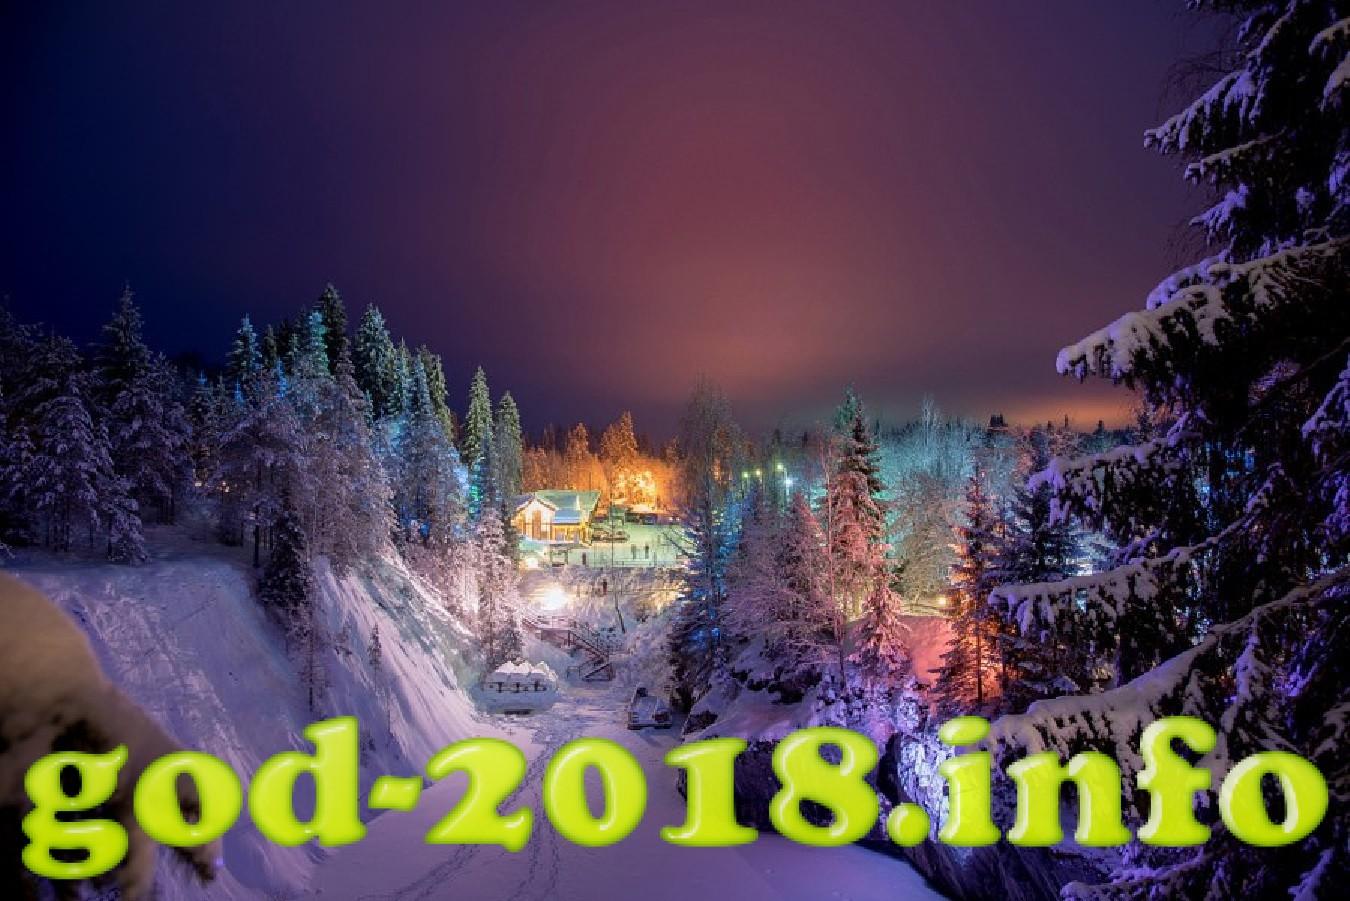 novyj-god-2018-v-karelii-kuda-shodit